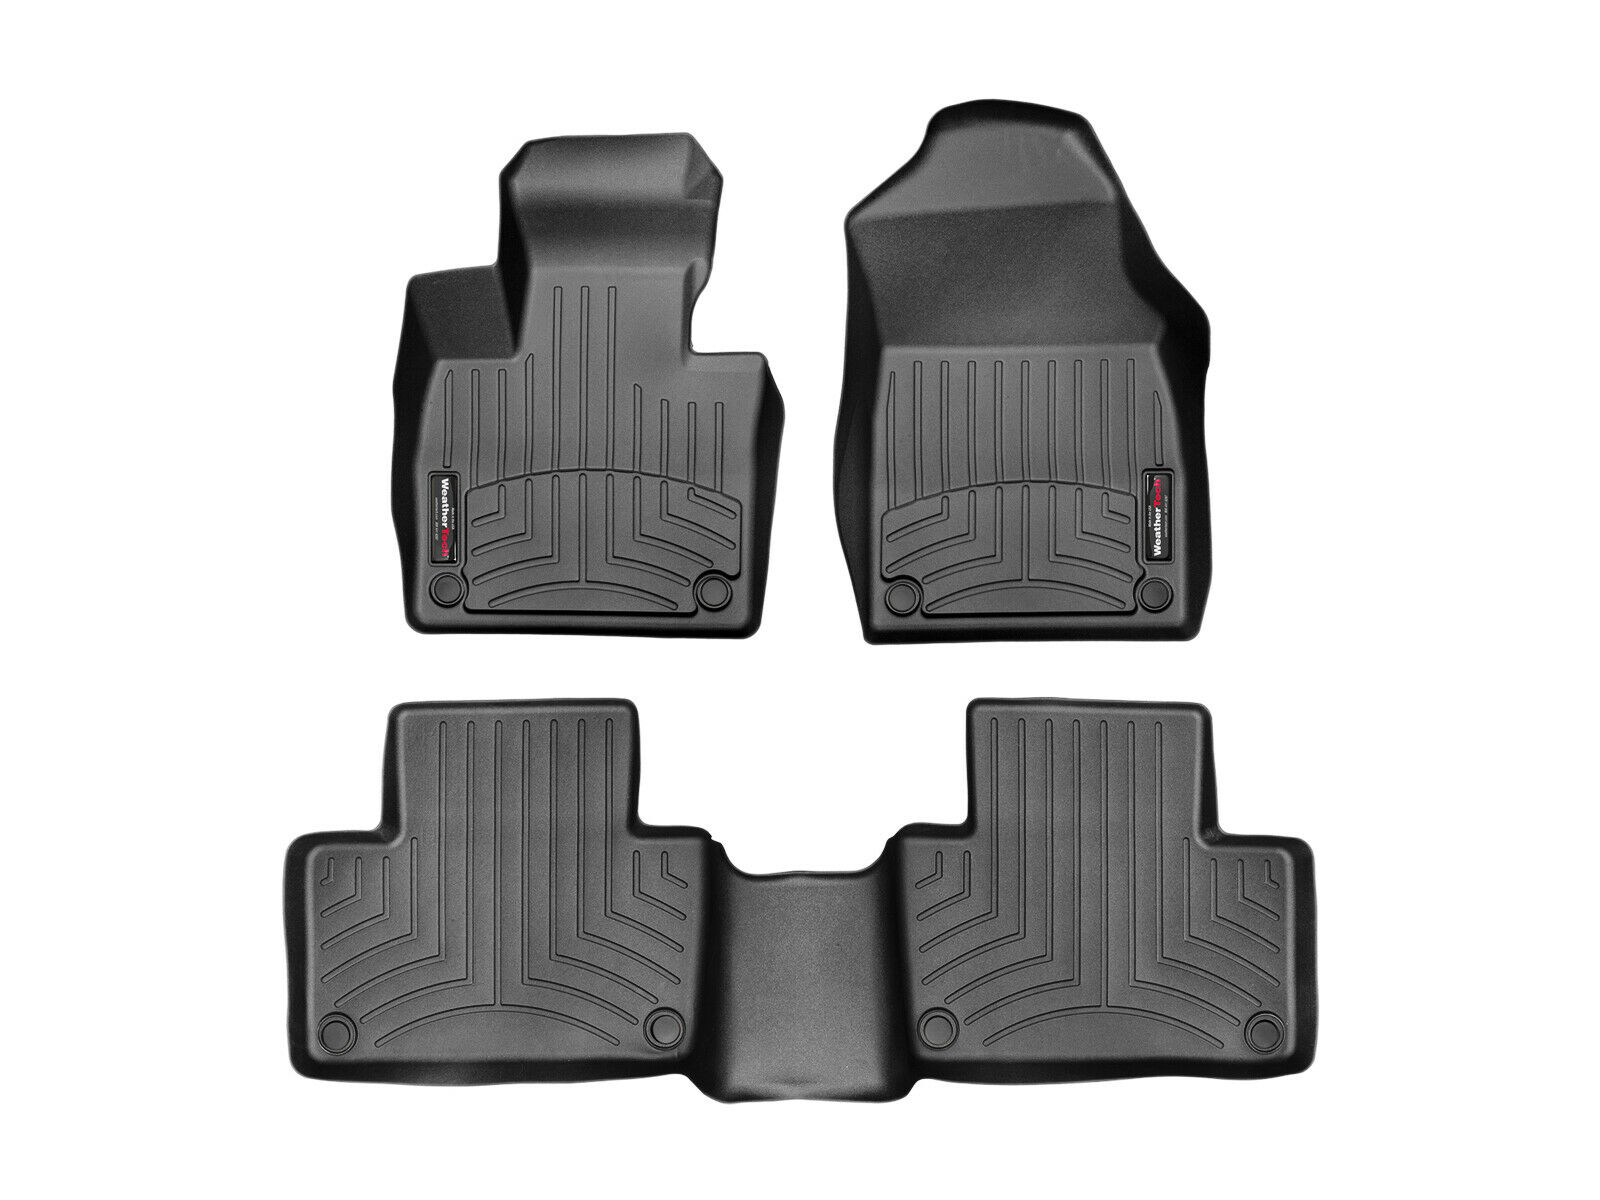 WeatherTech Custom Fit Rear FloorLiner for Ford Explorer Black